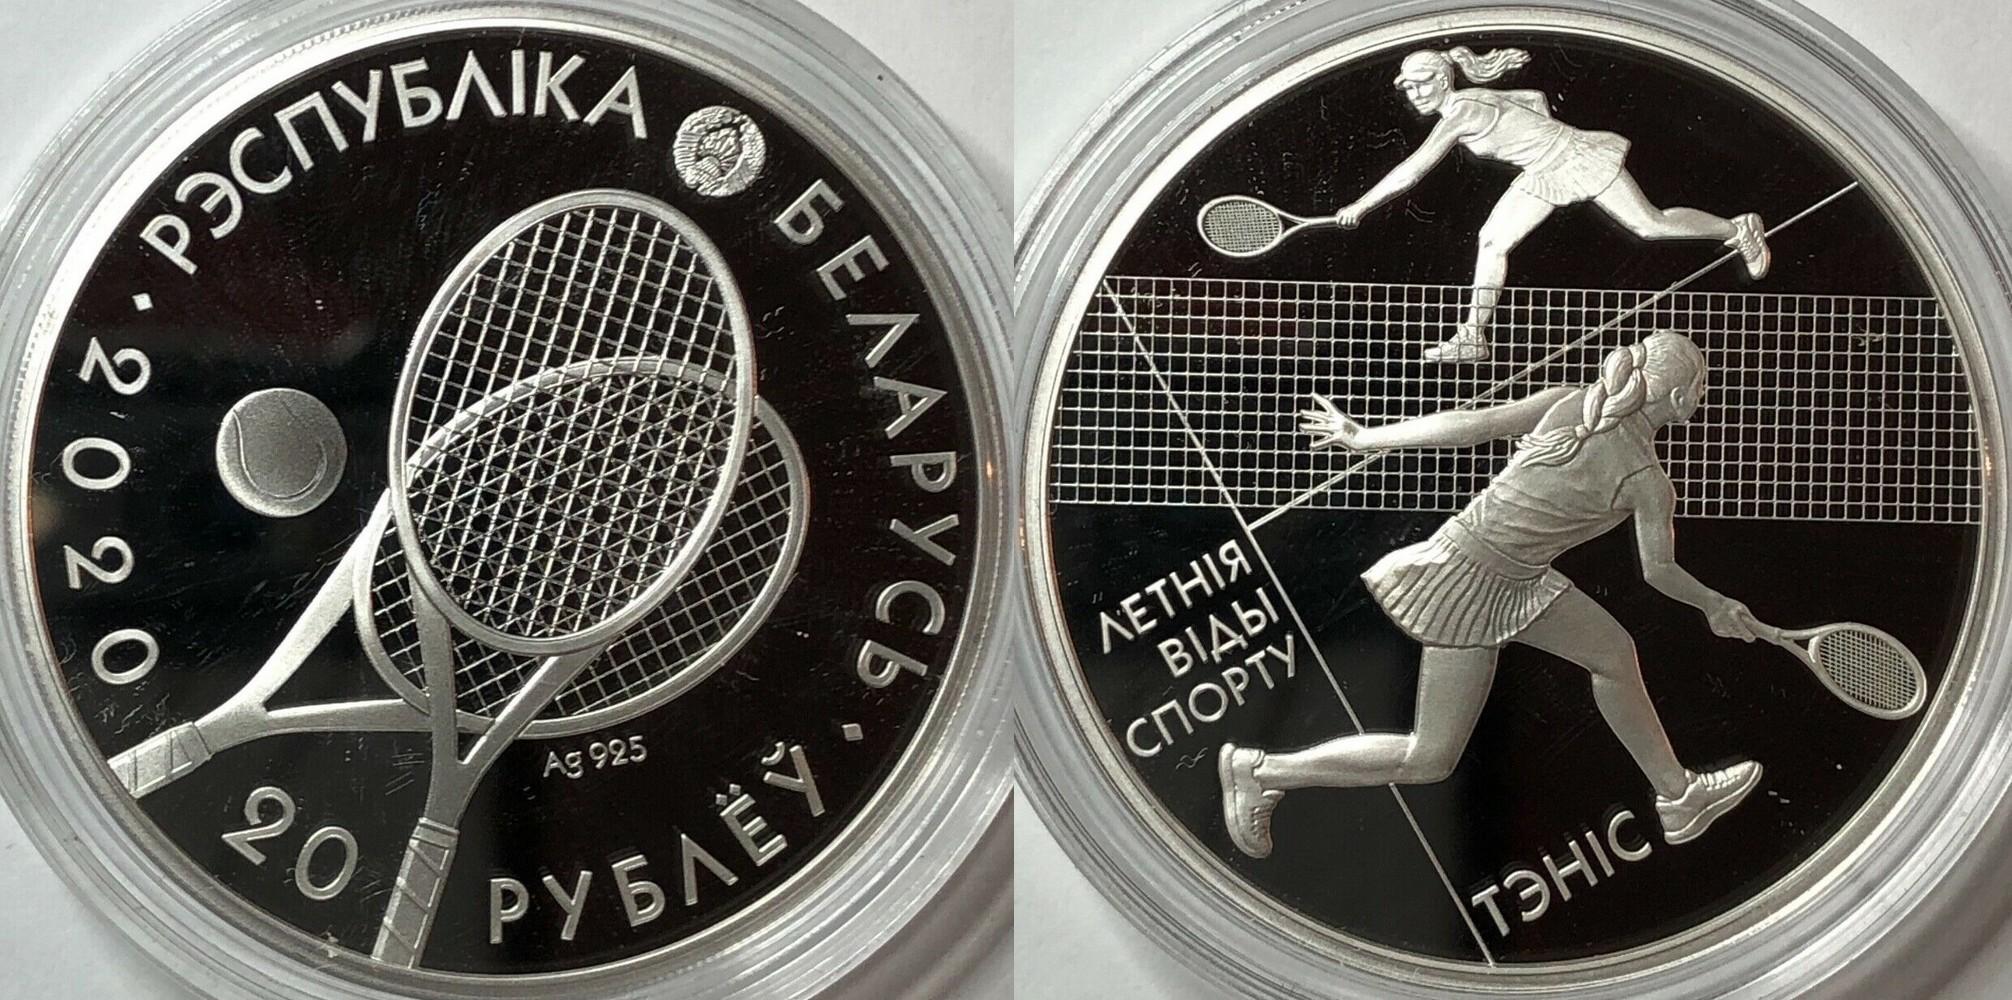 belarus-2020-sports-dete-tennis